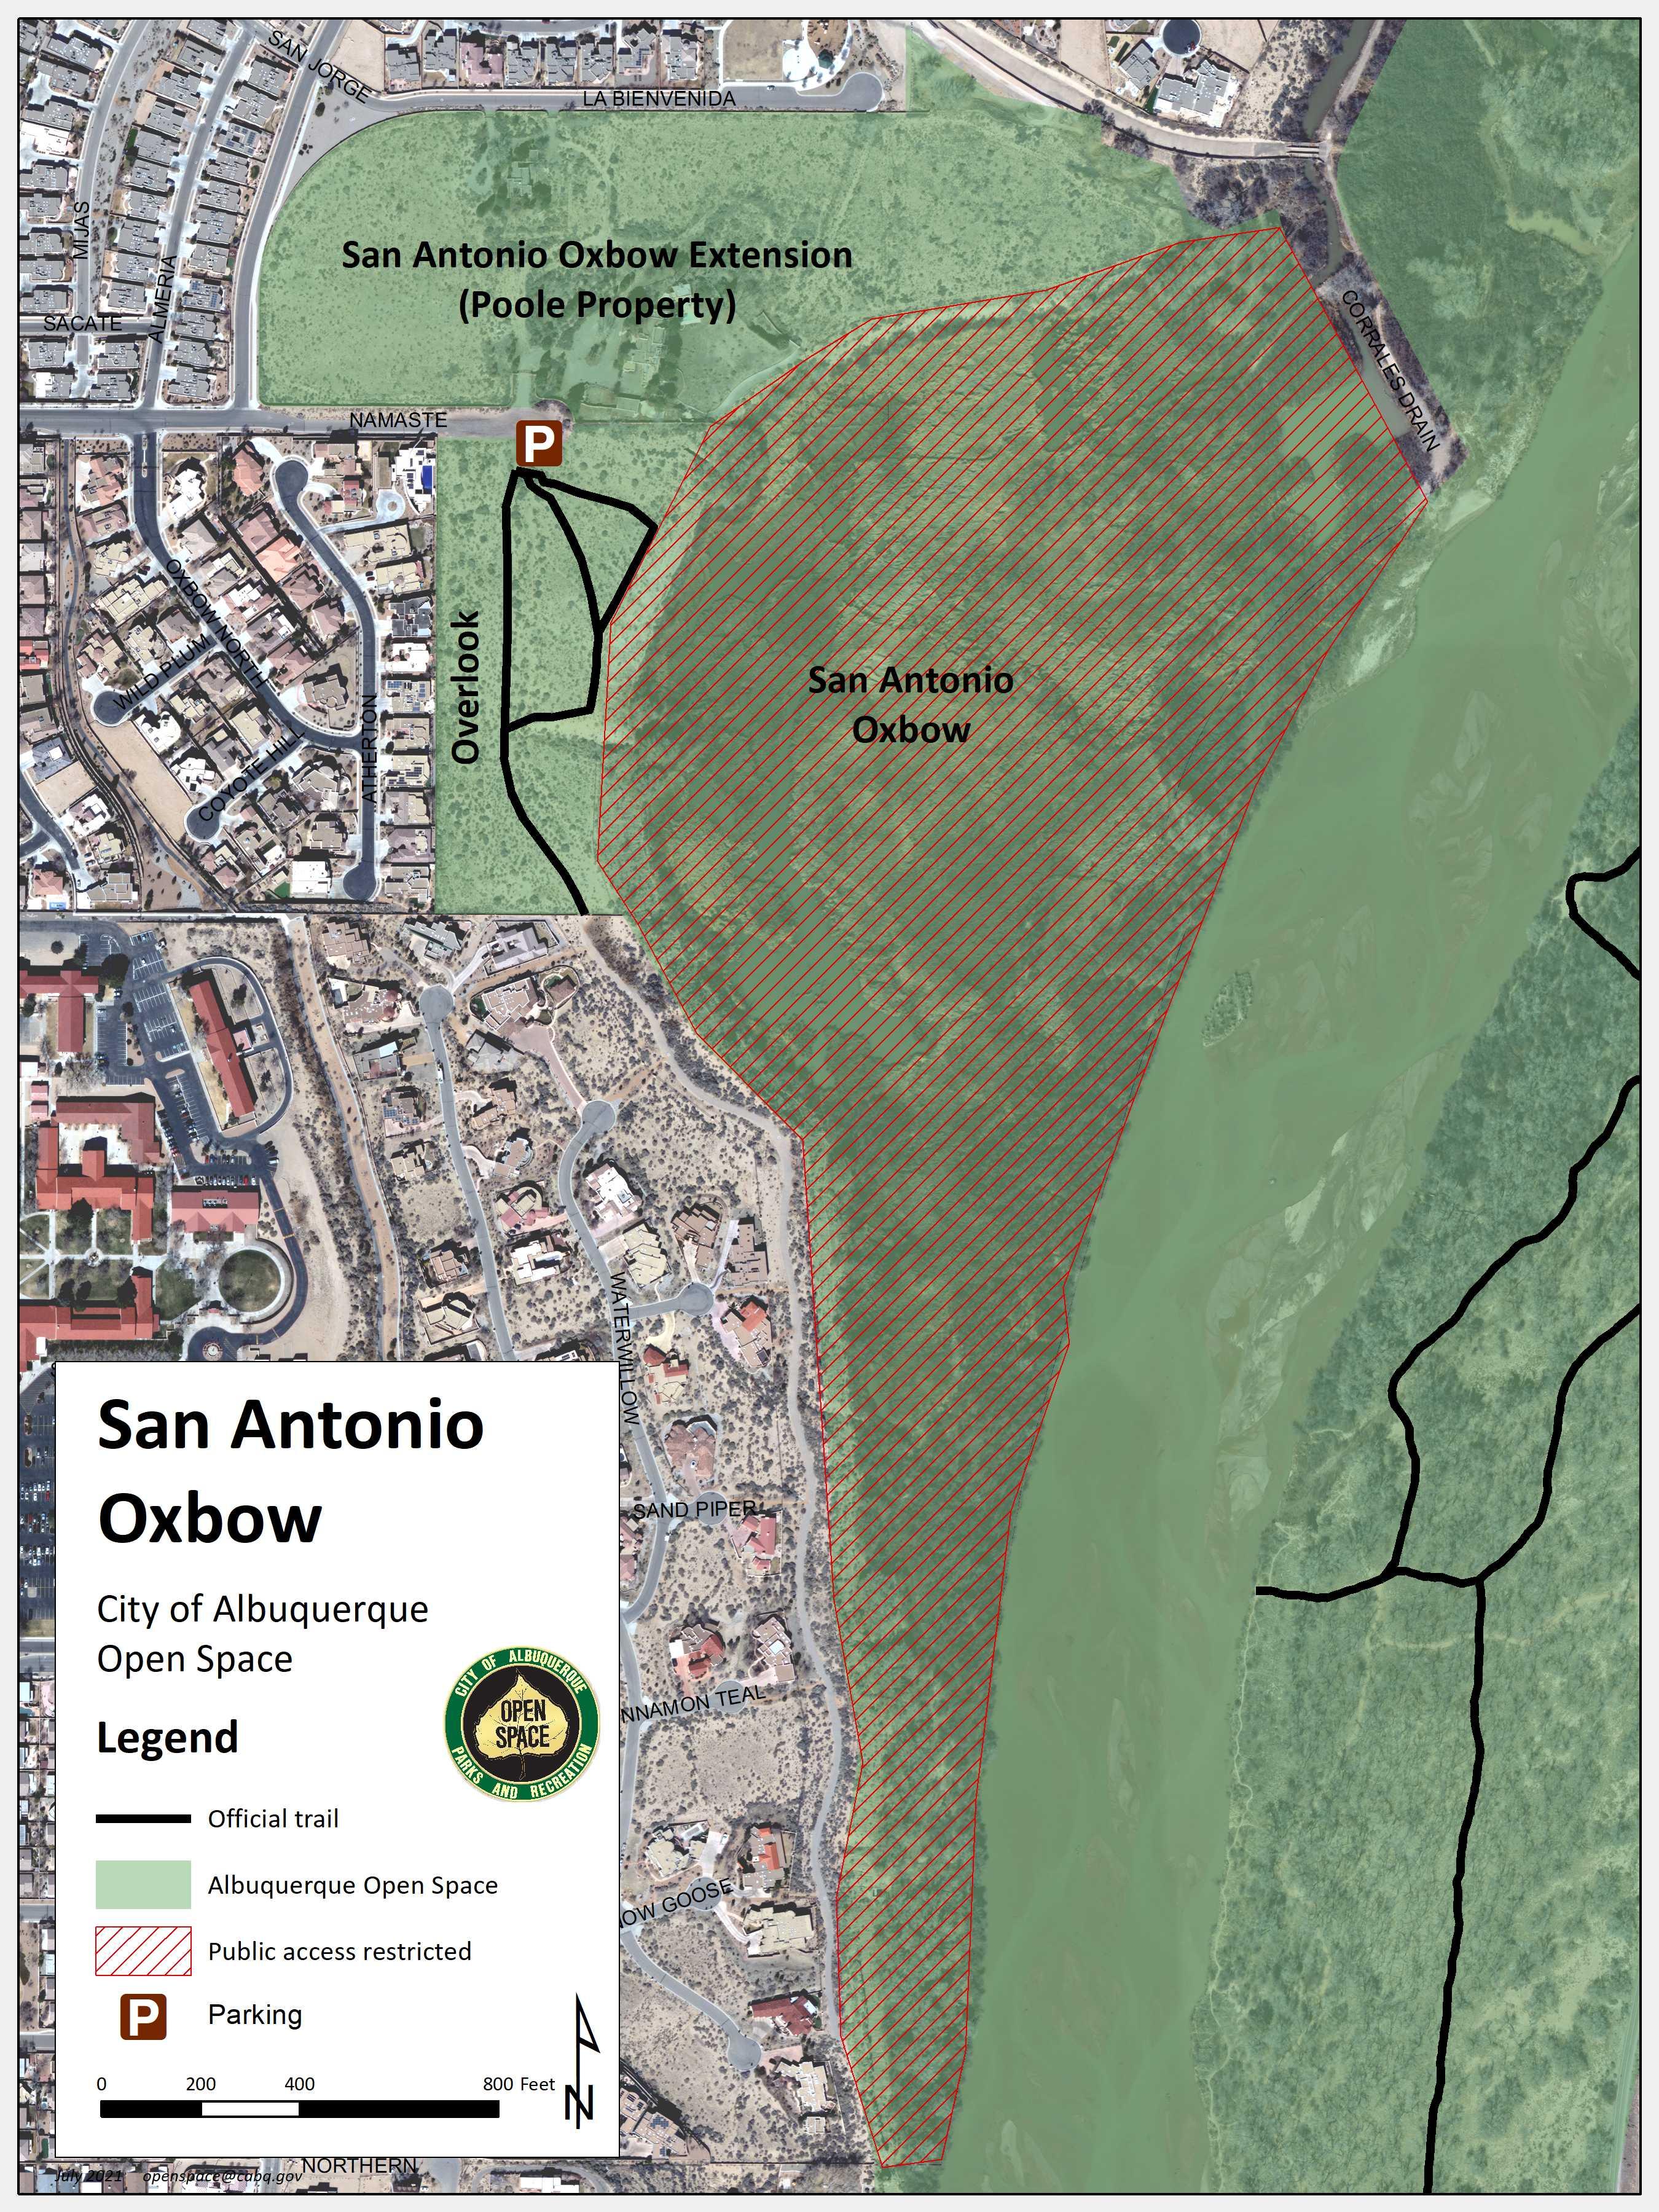 San Antonio Oxbow trail map